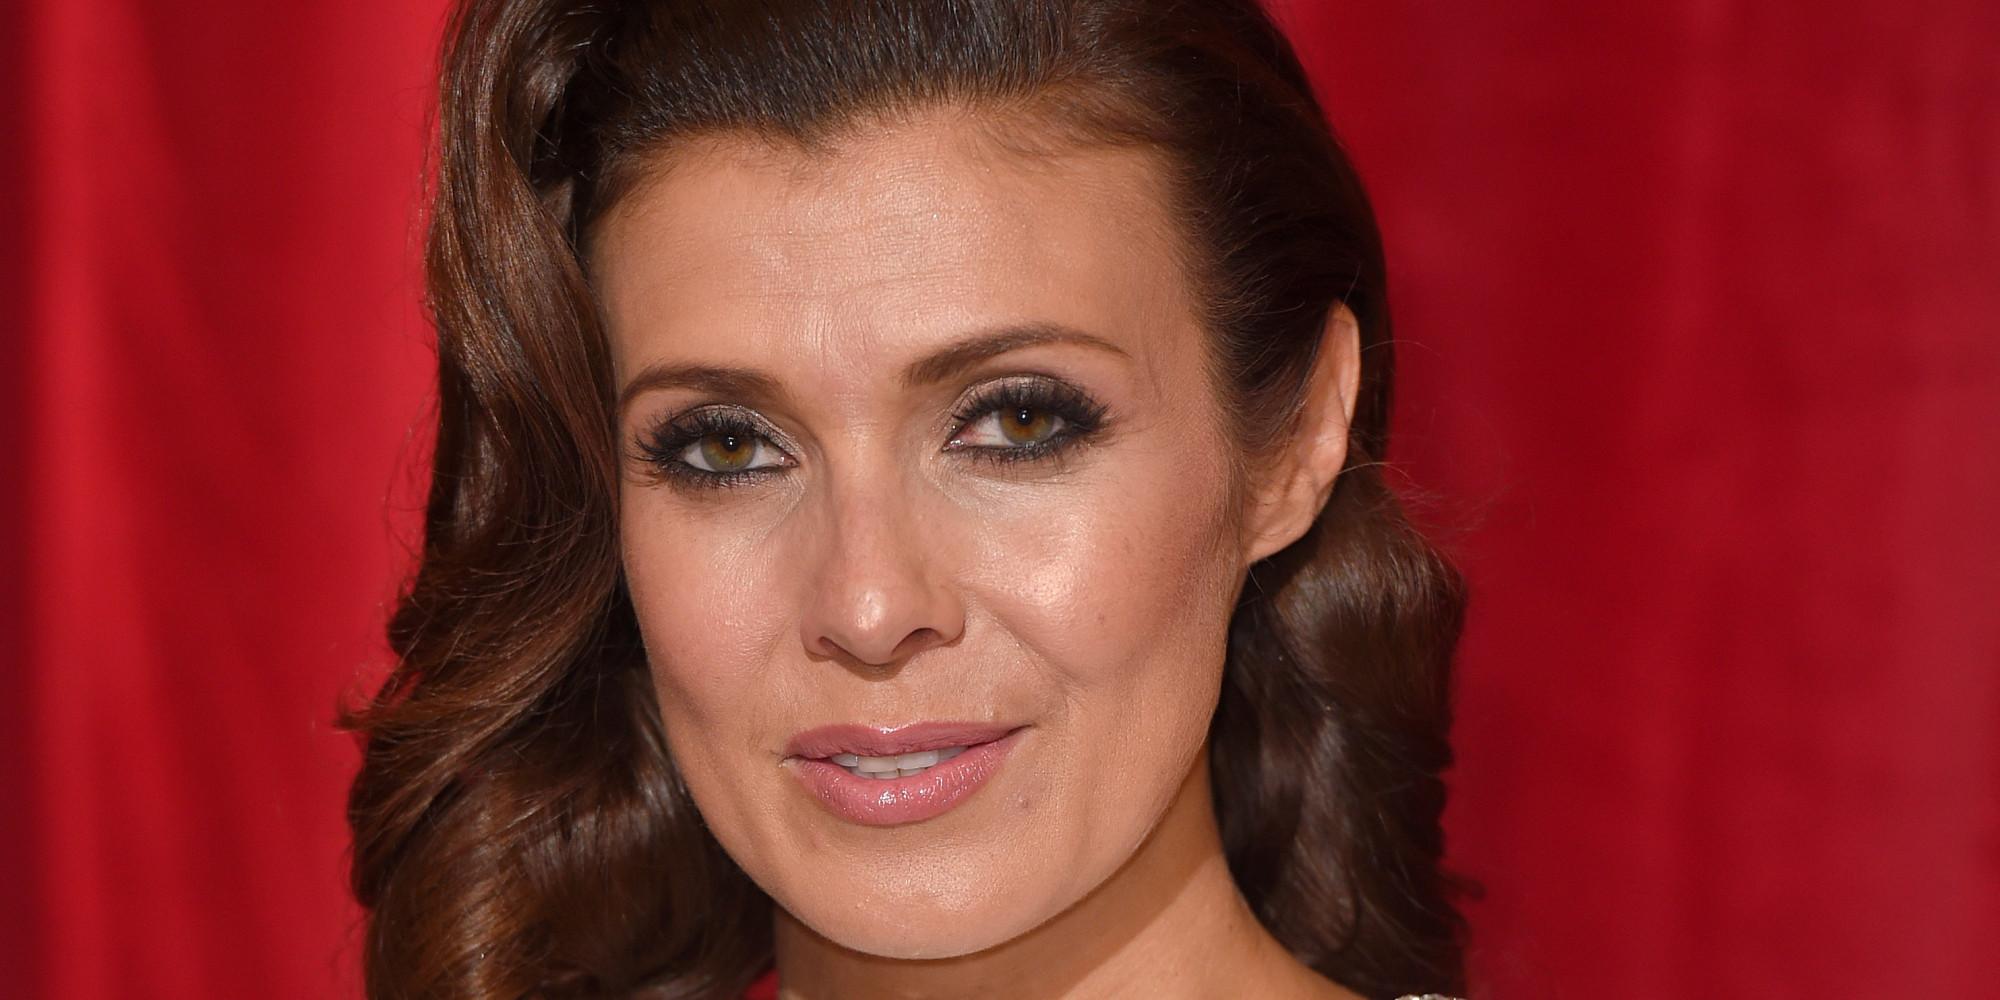 Peachy Kym Marsh Back With Ex Coronation Street Star Rekindles Hairstyles For Women Draintrainus